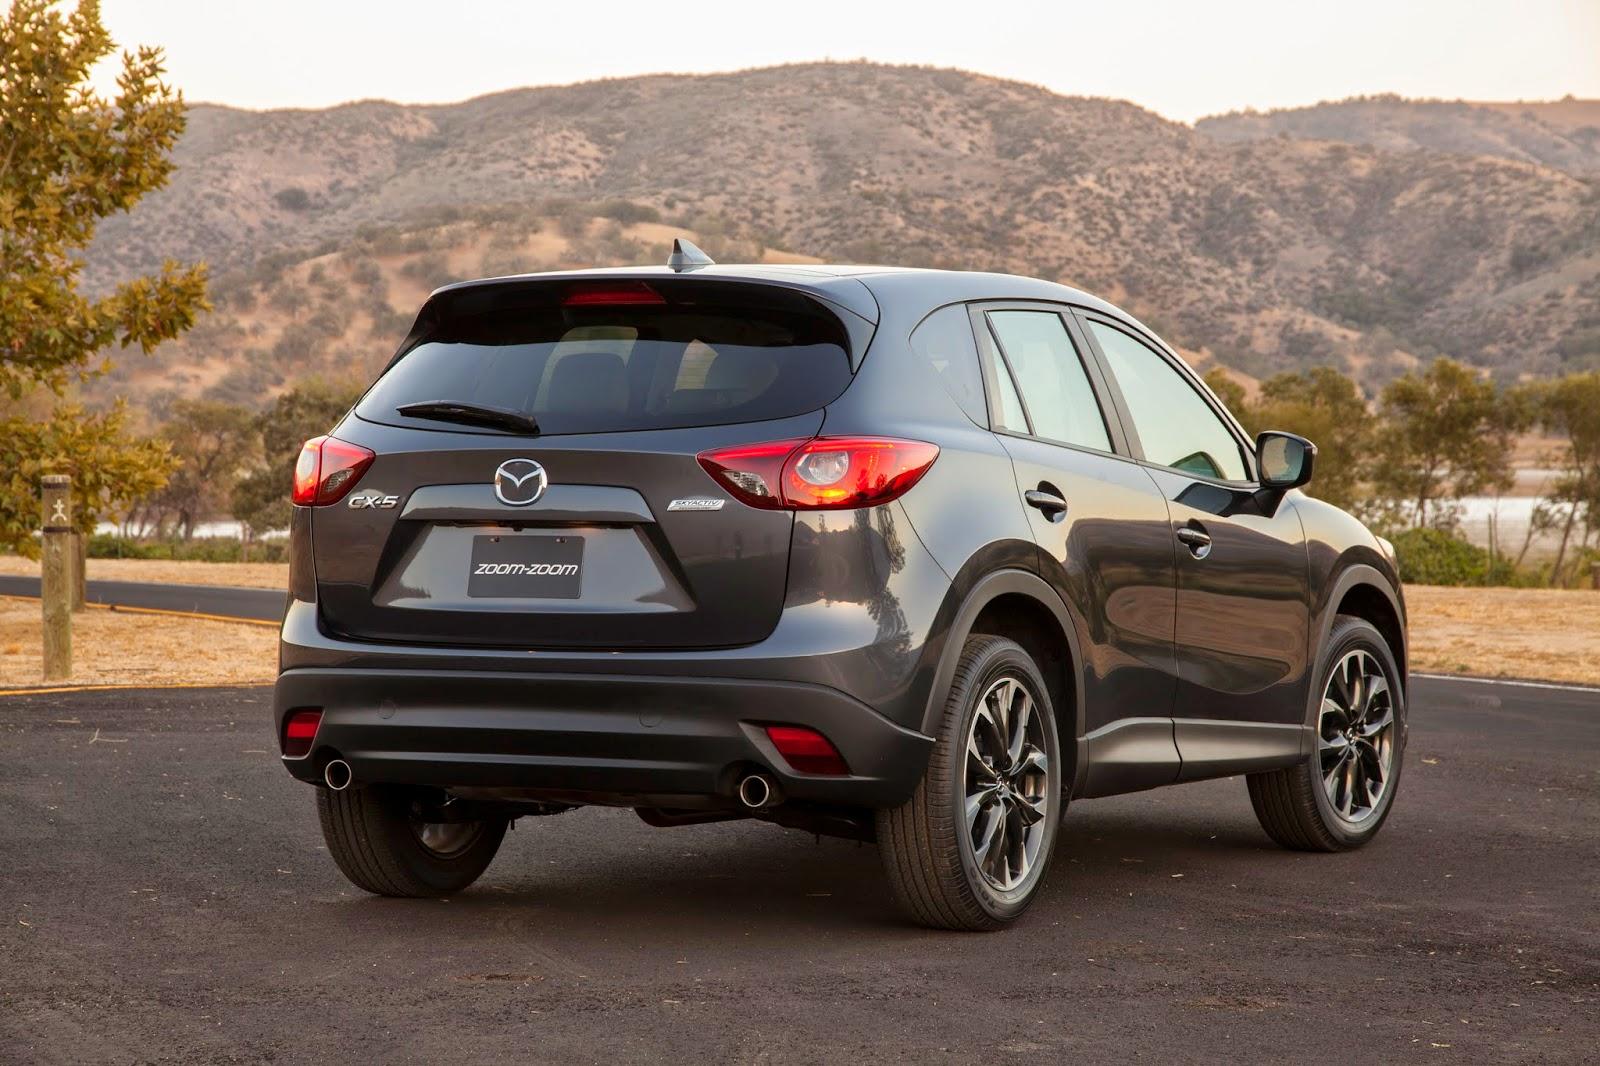 Rear 3/4 view of 2016 Mazda CX-5